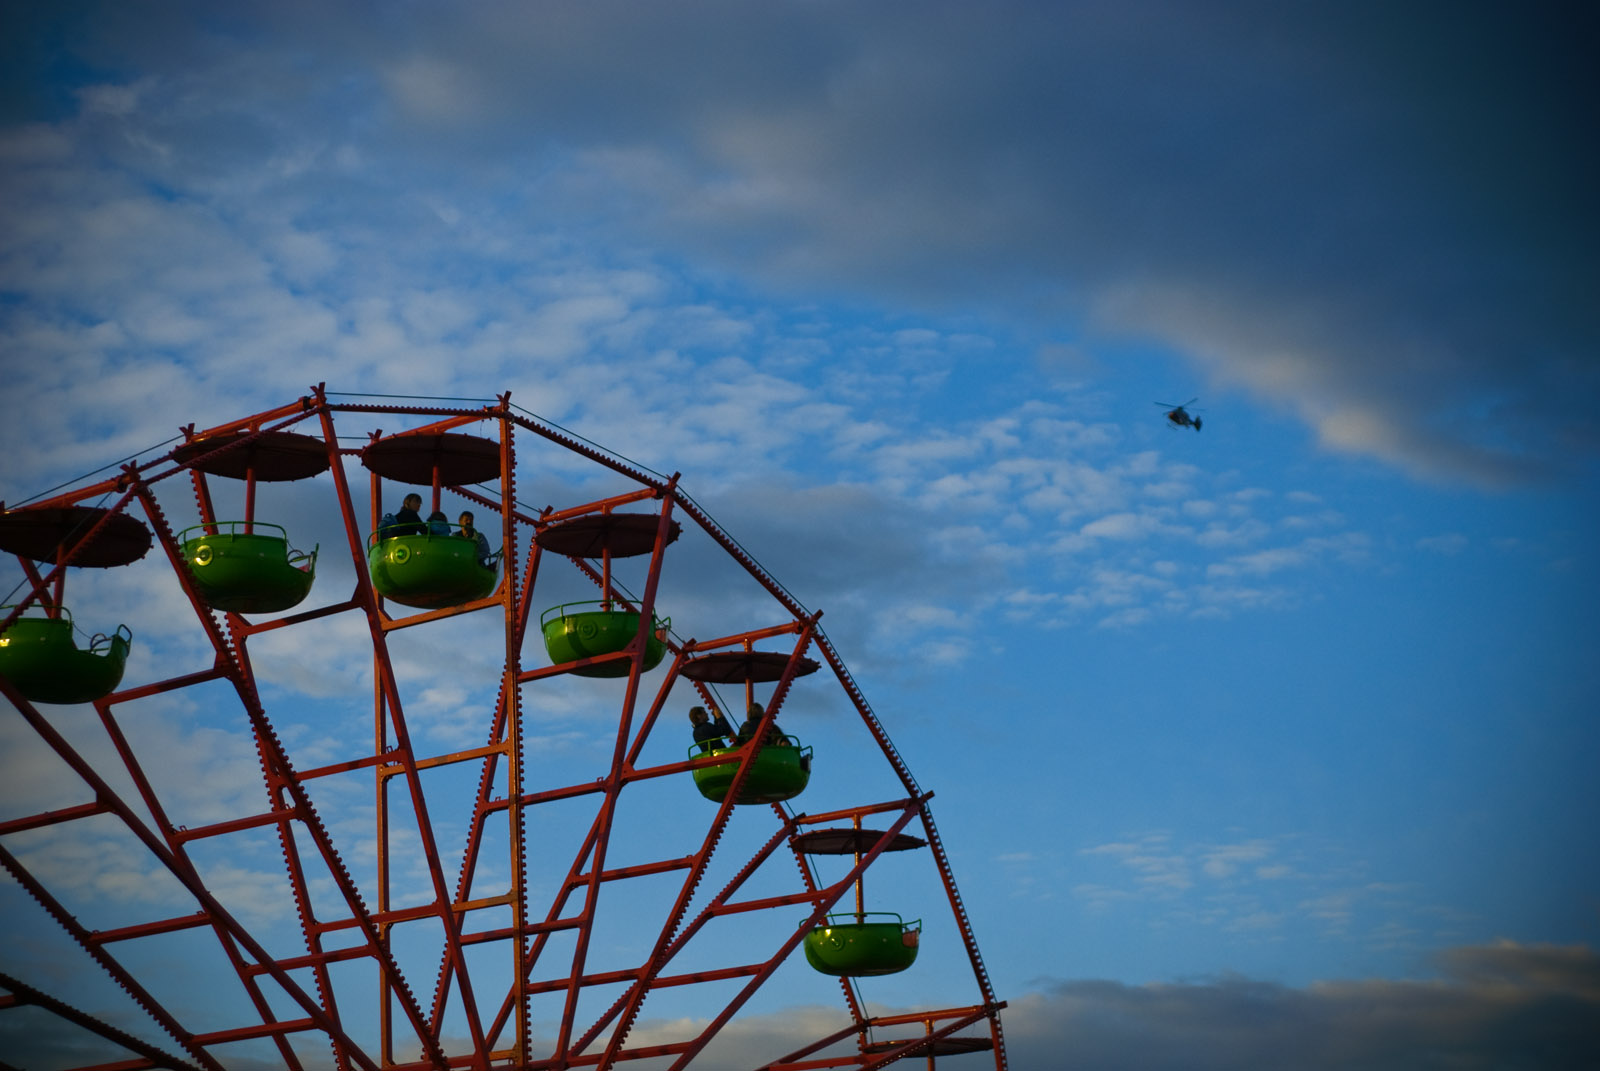 Ars Electronica Ferris Wheel